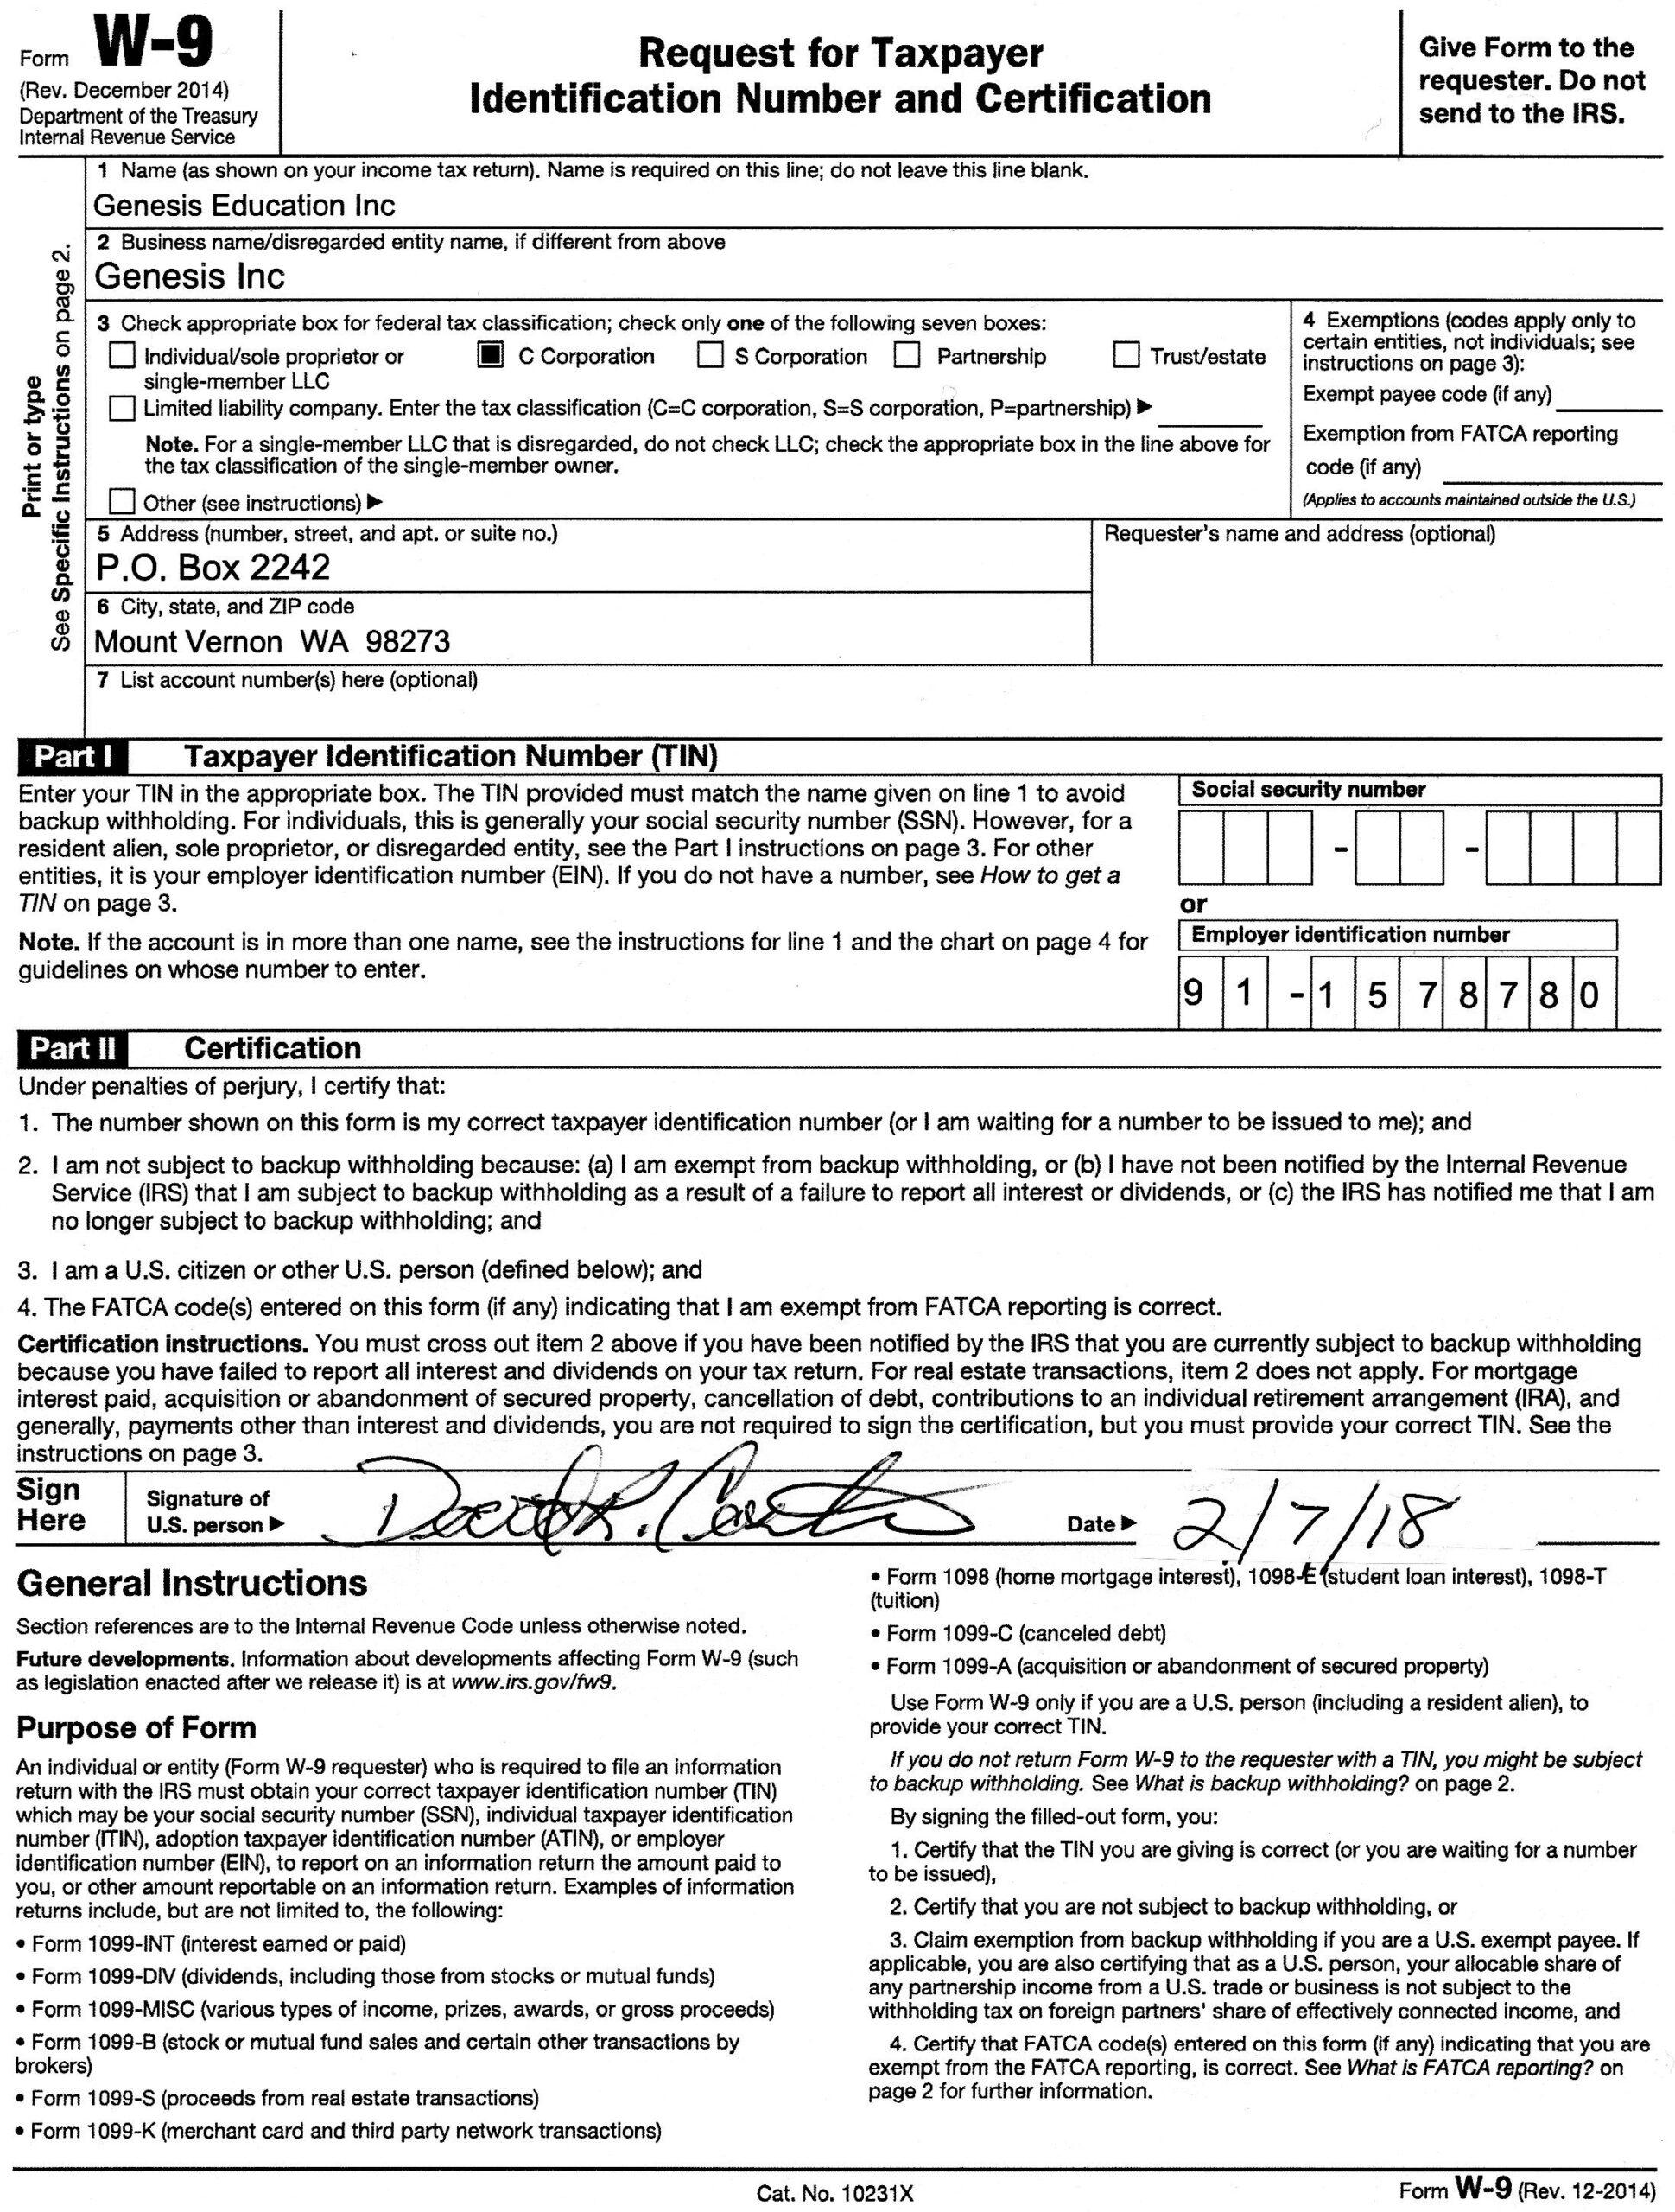 2020 W-9 Form Printable Pdf   Example Calendar Printable with Print Free W9 Form